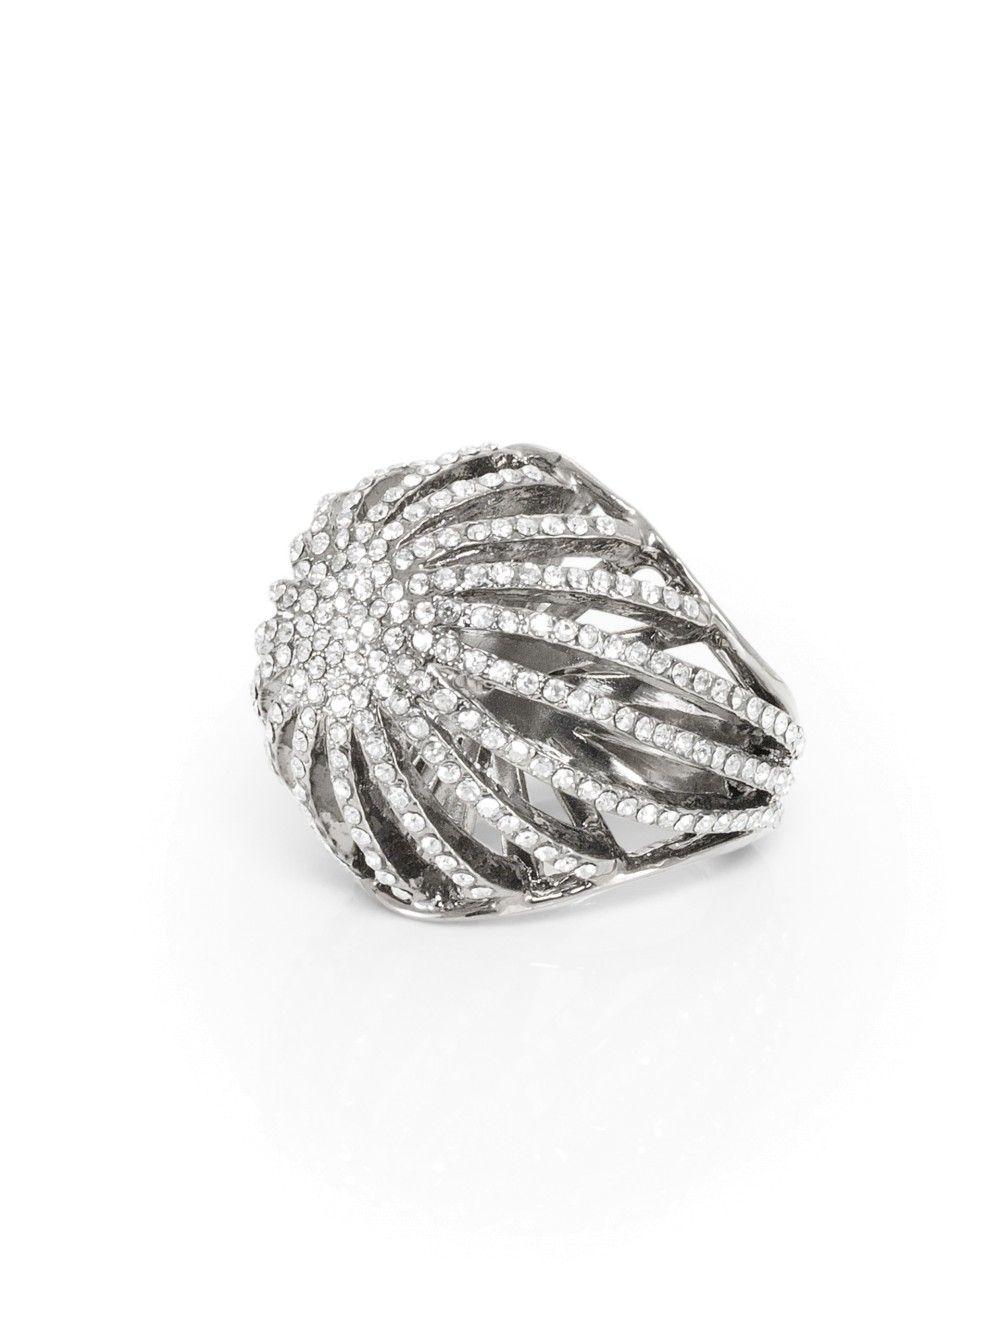 Swarovski Crystal Cocktail Ring | St. John Knits